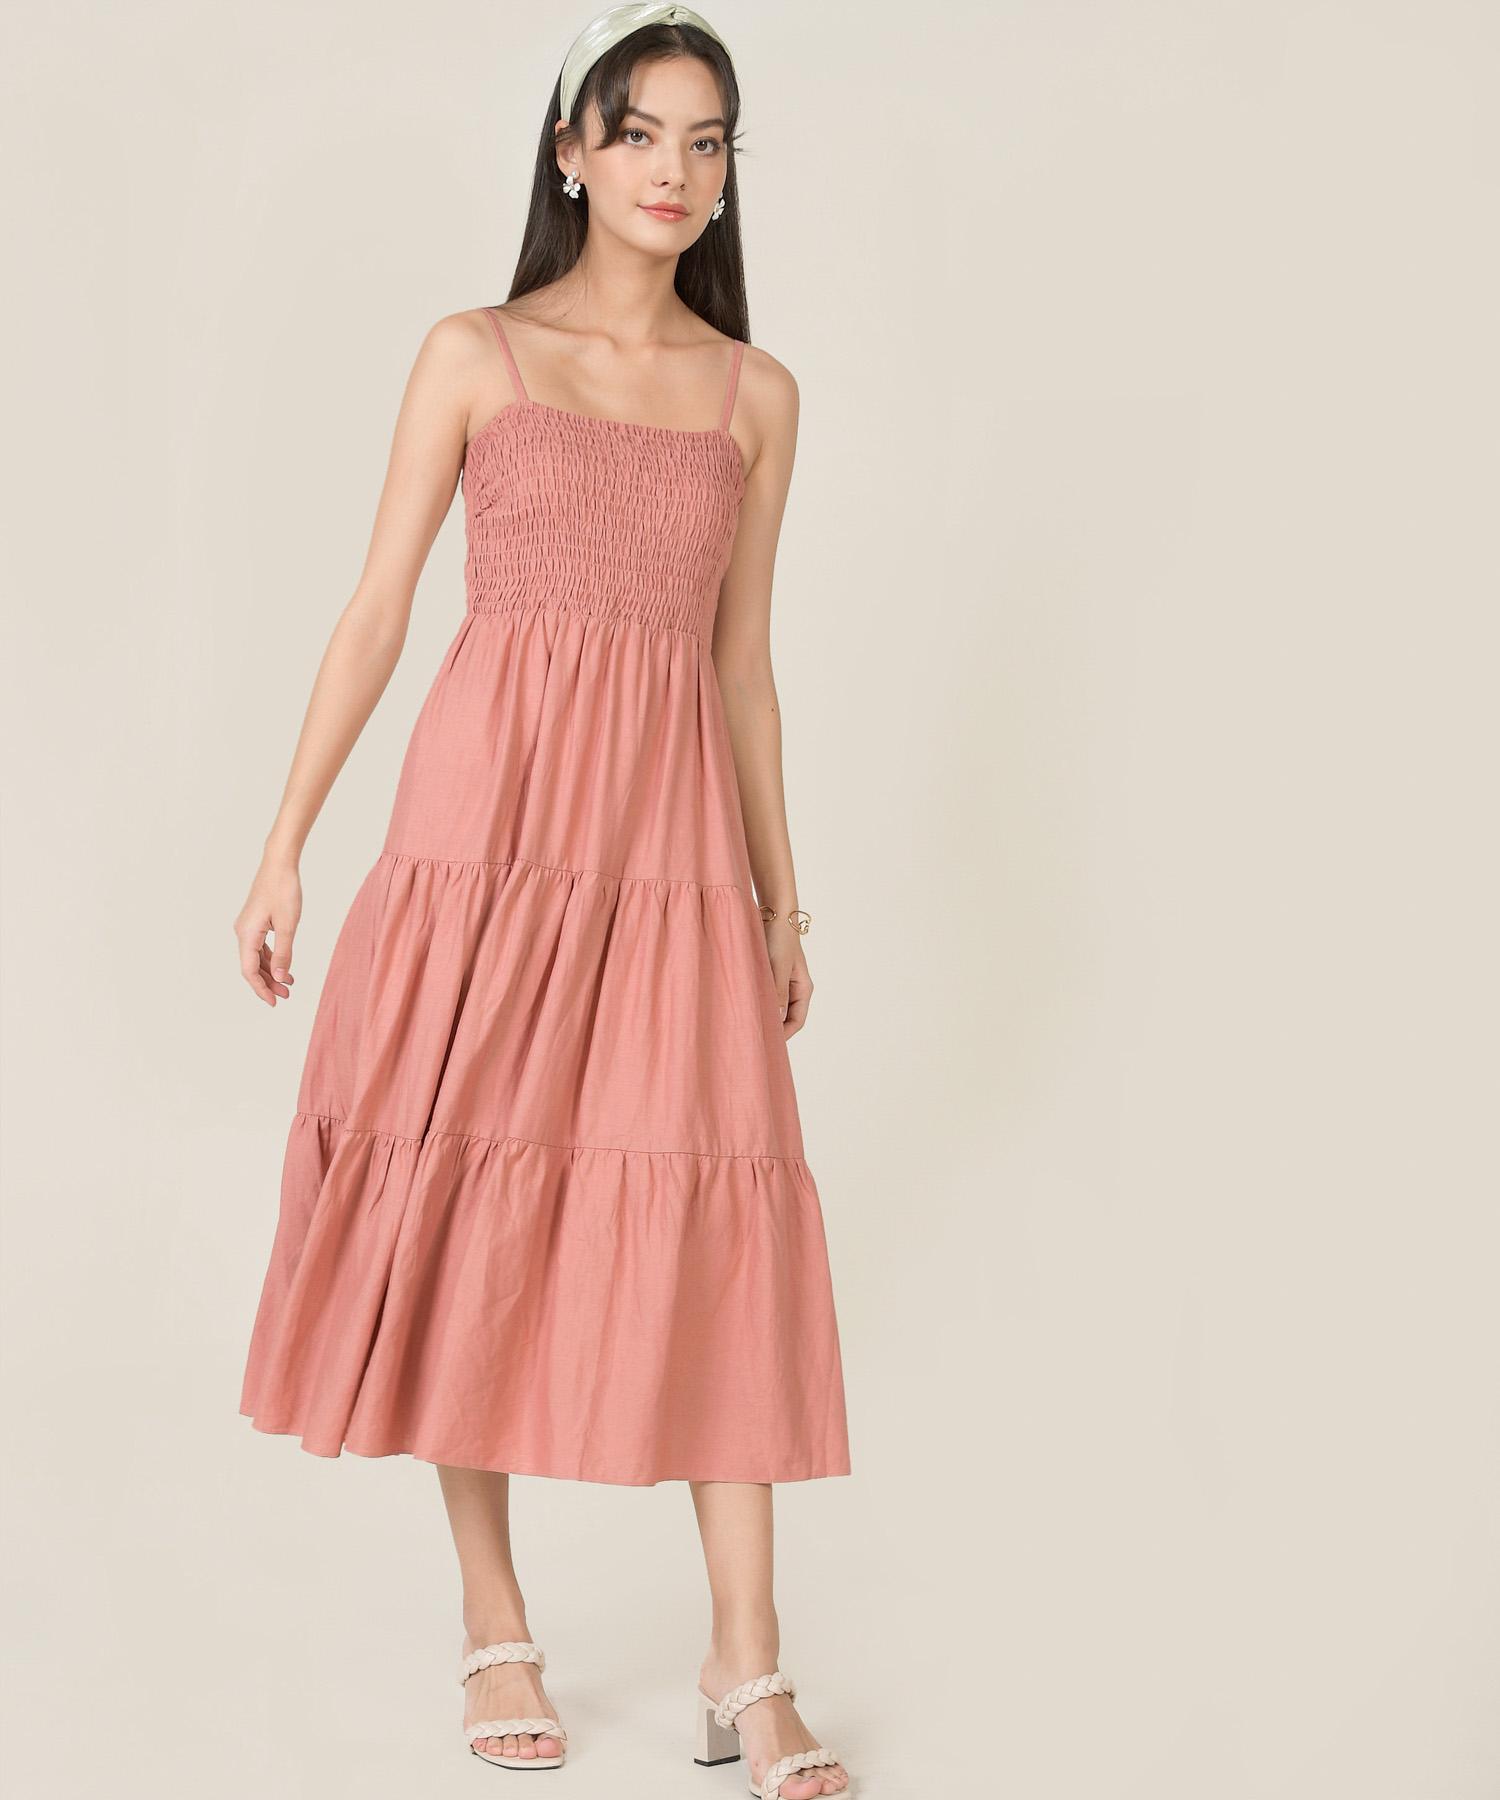 lalique-smocked-maxi-dress-rose-pink-4